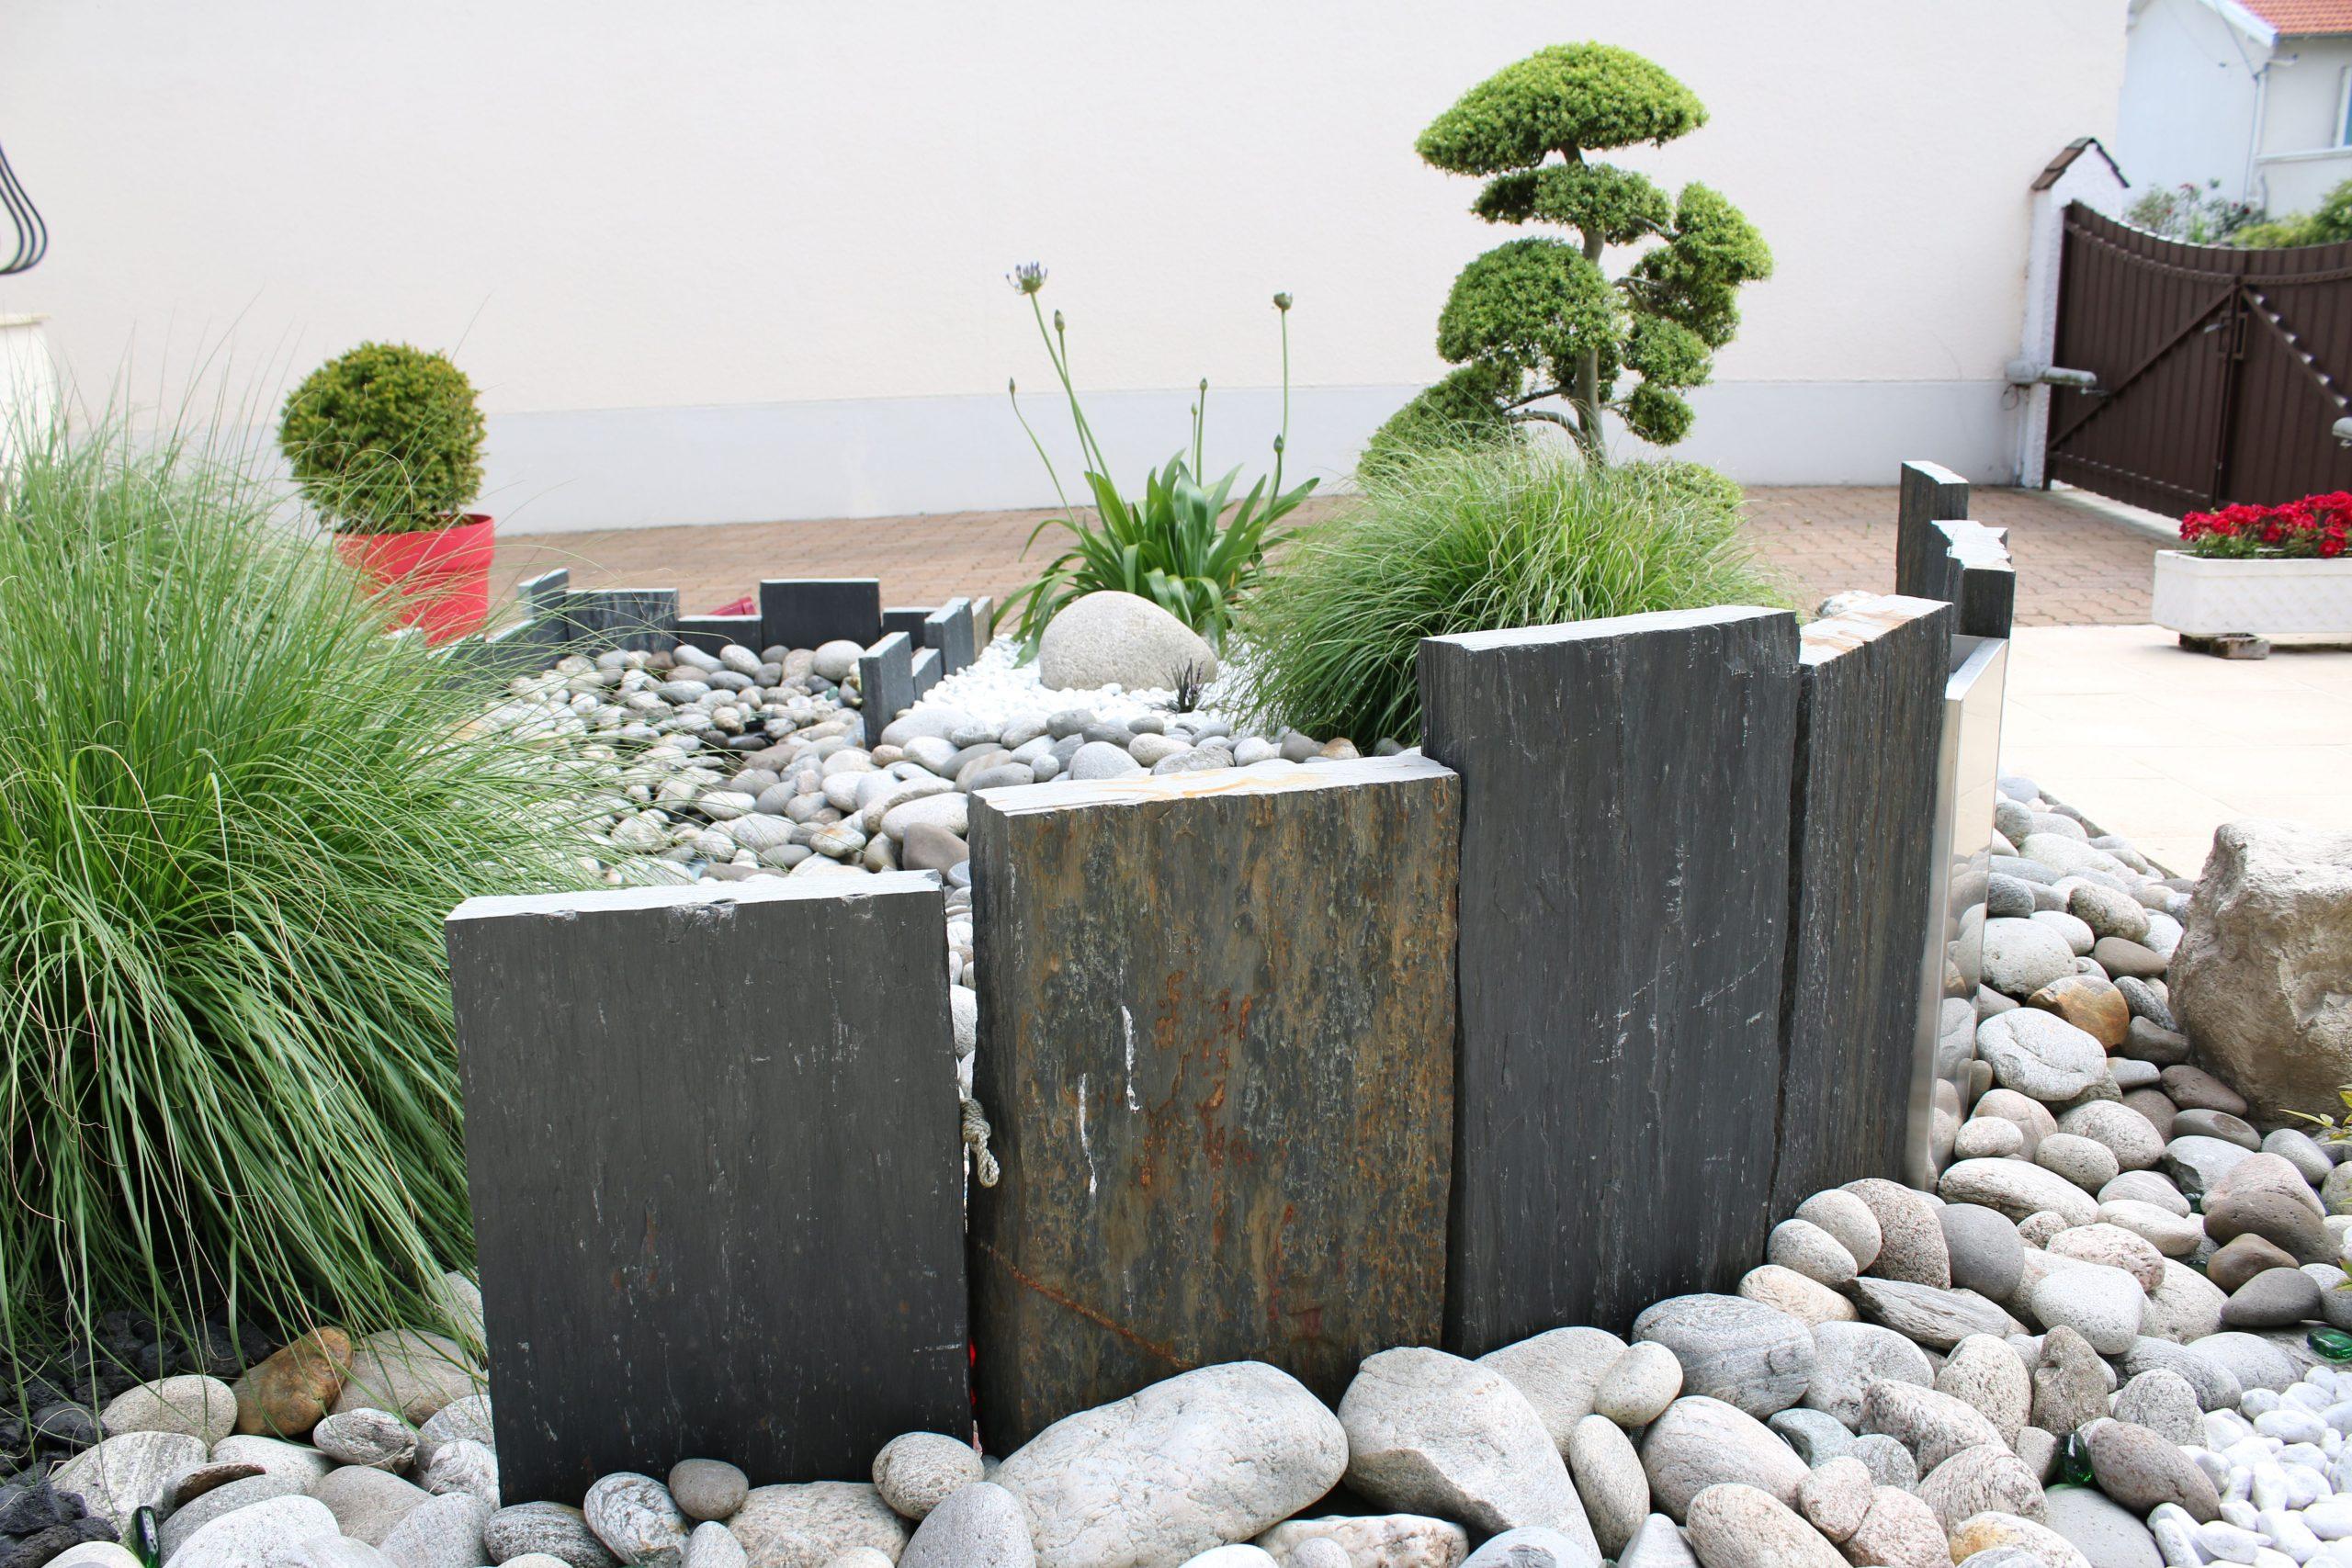 Rebeyrol, Rebeyrol Créateur De Jardins, Muret, Muret ... tout Conception Jardin Limoges